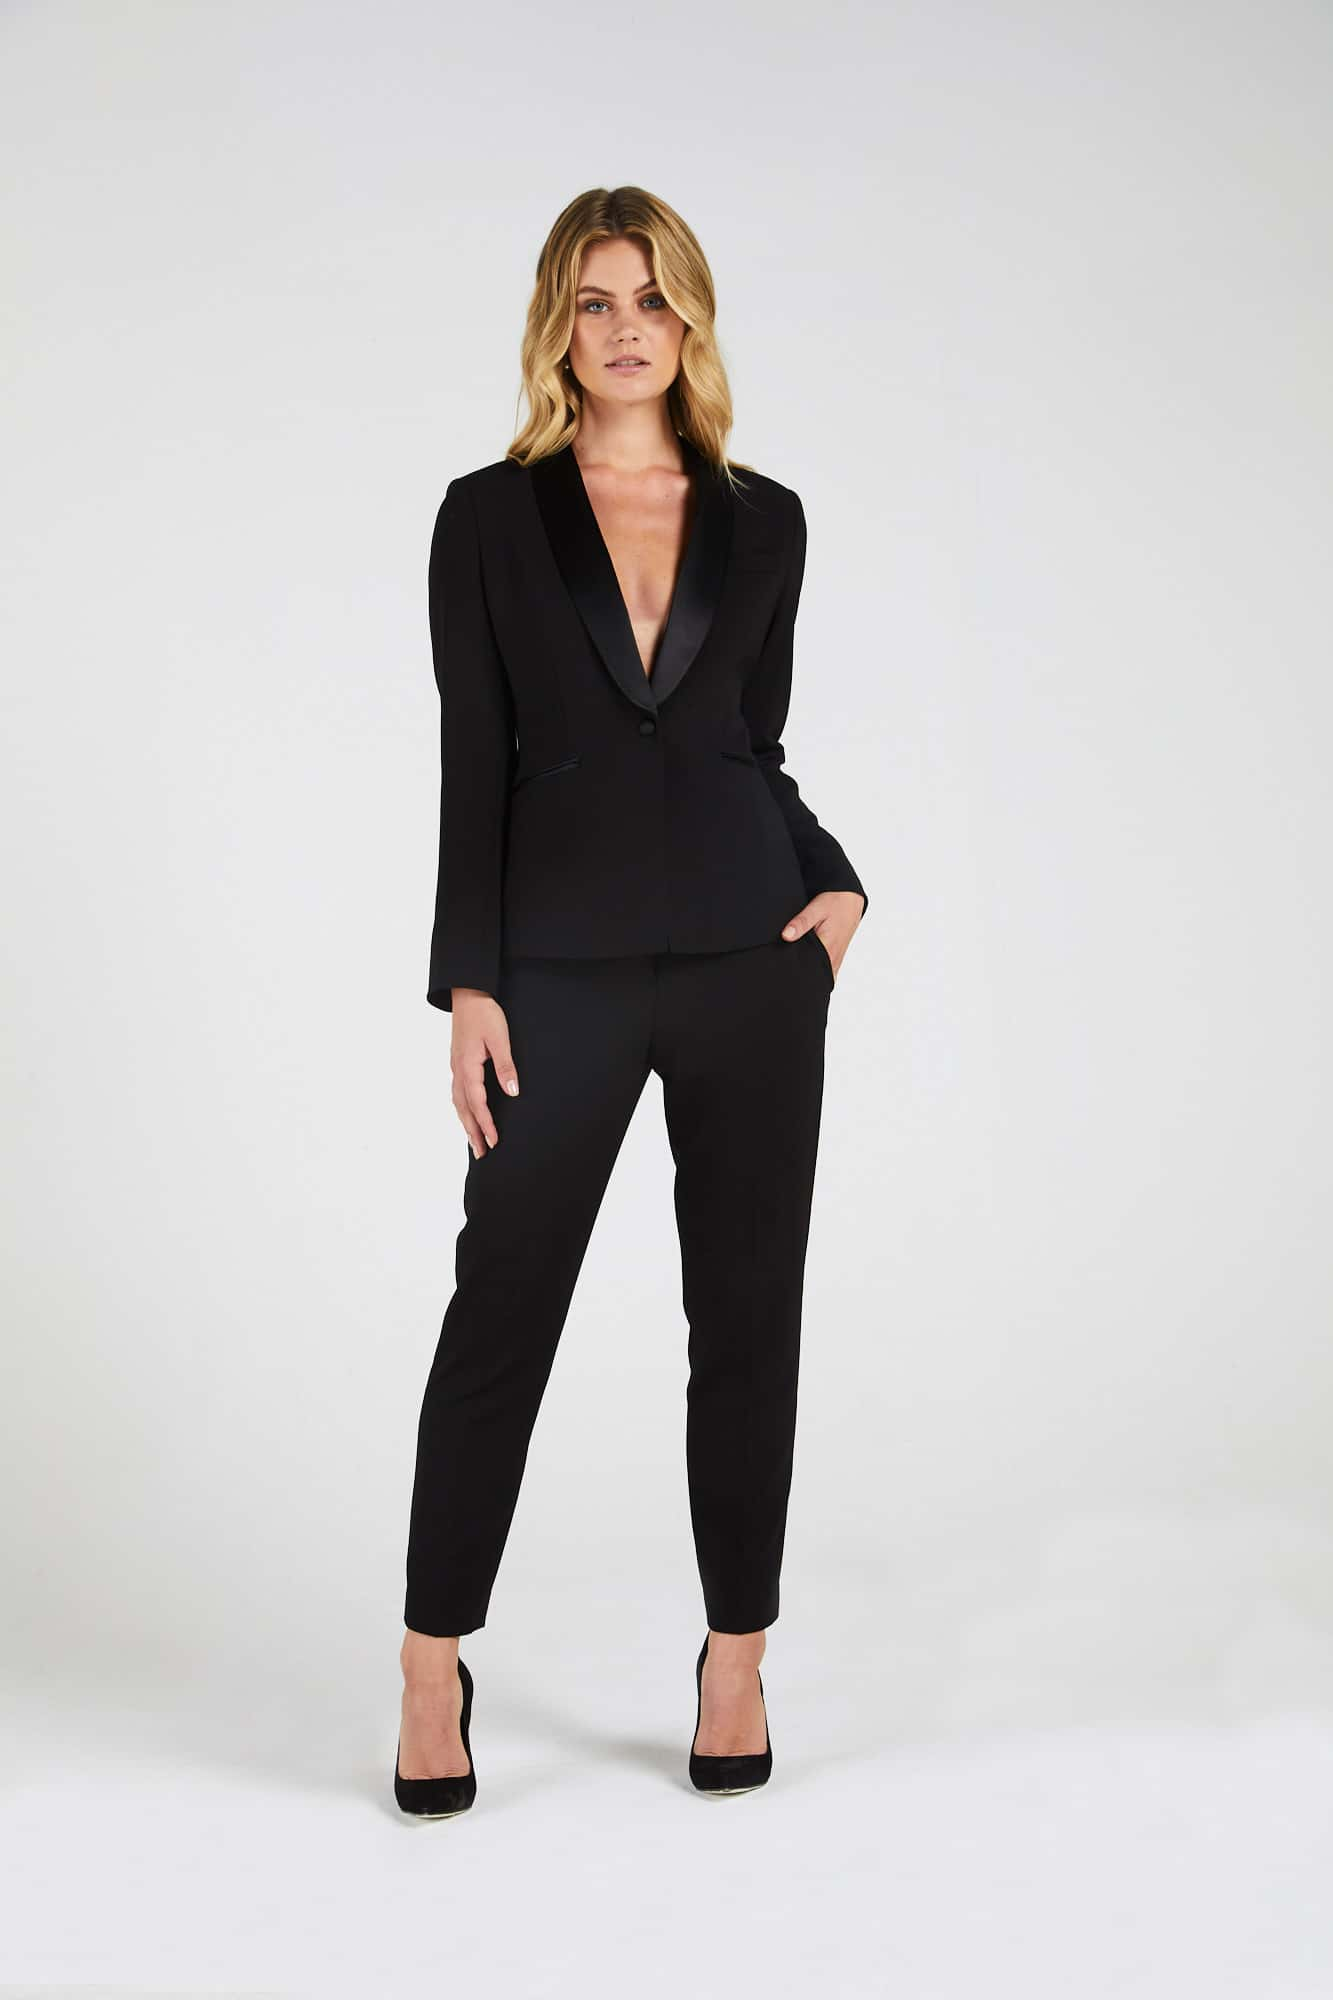 InStitchu Collection The Travers Black Tuxedo Jacket